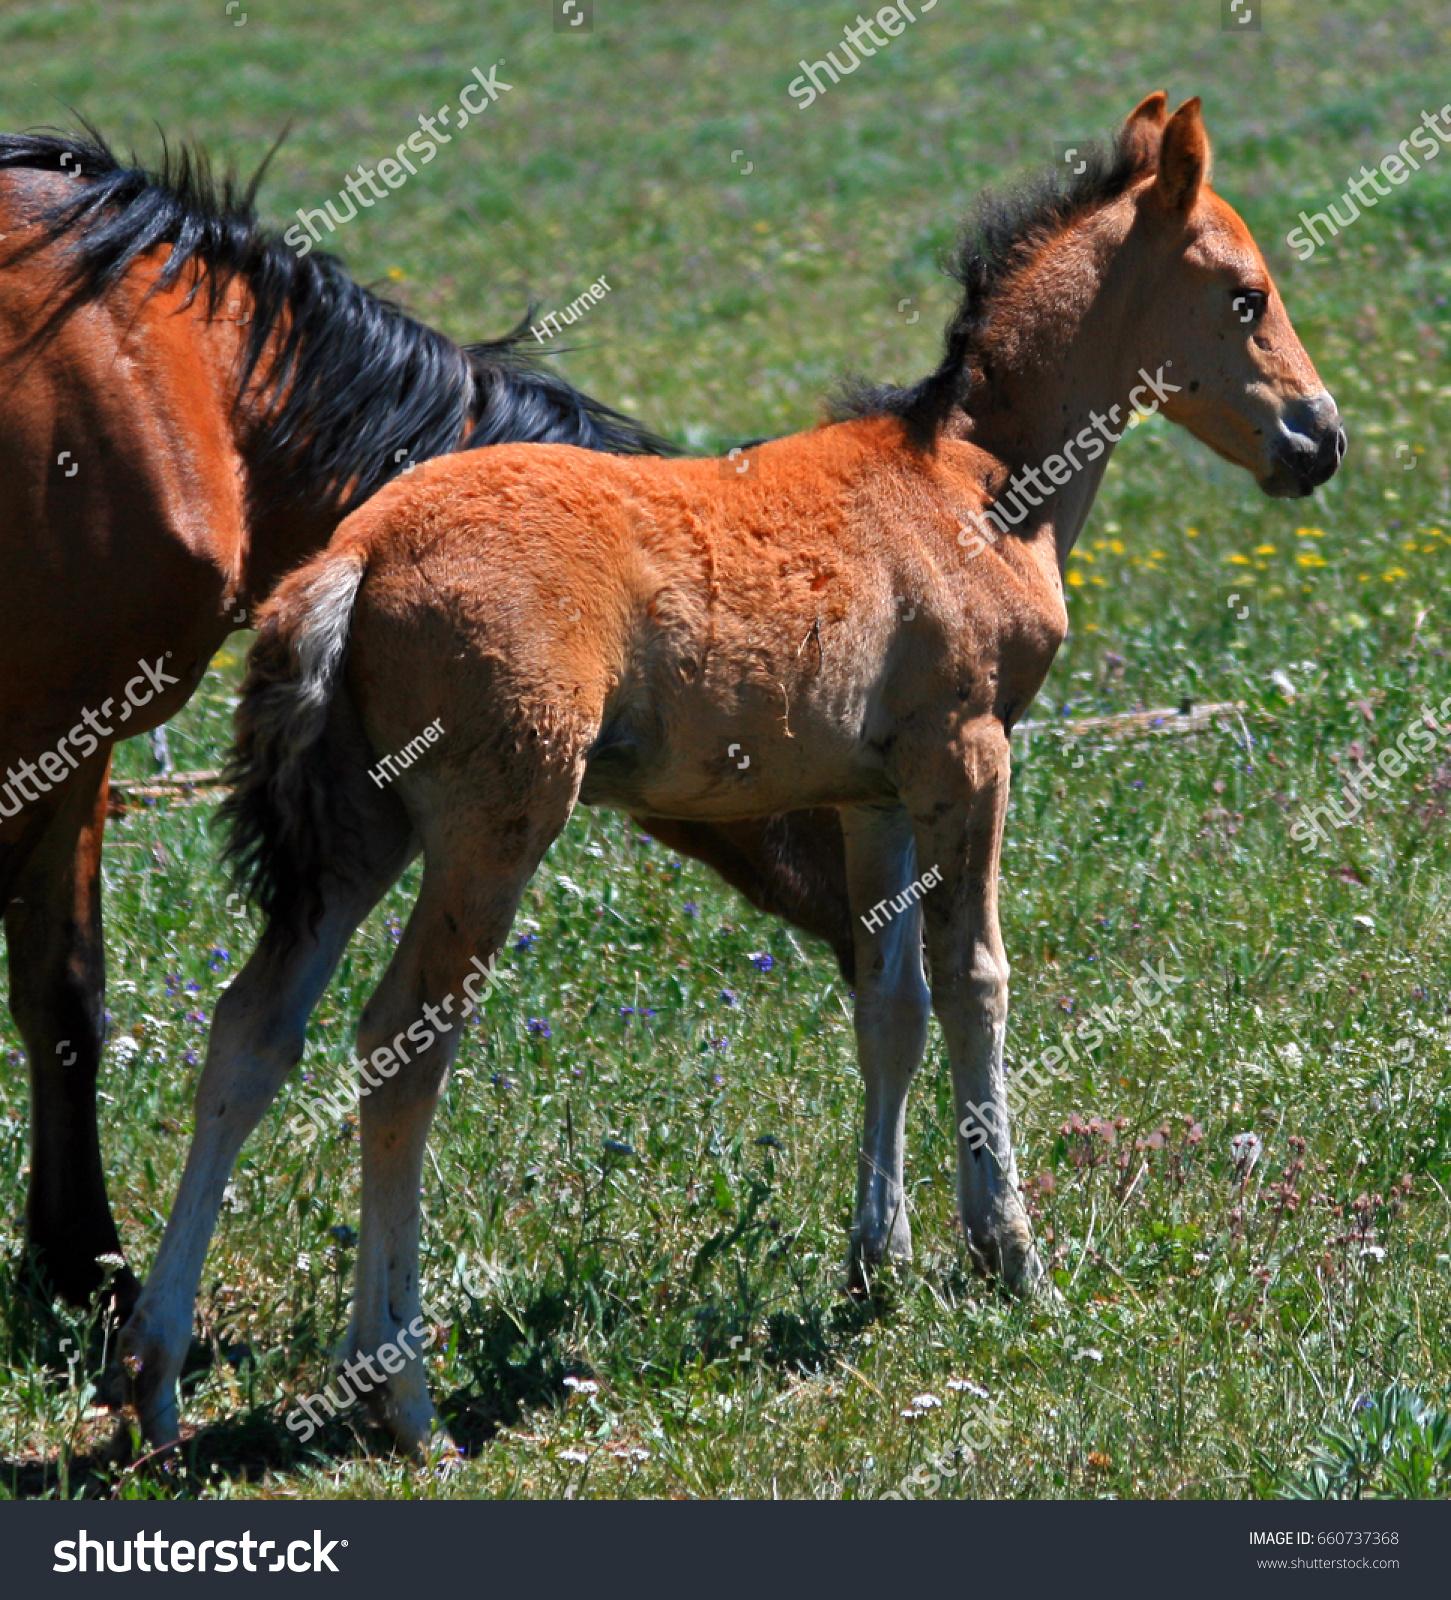 Wild Horse Mustang Buckskin Baby Colt Stock Photo Edit Now 660737368